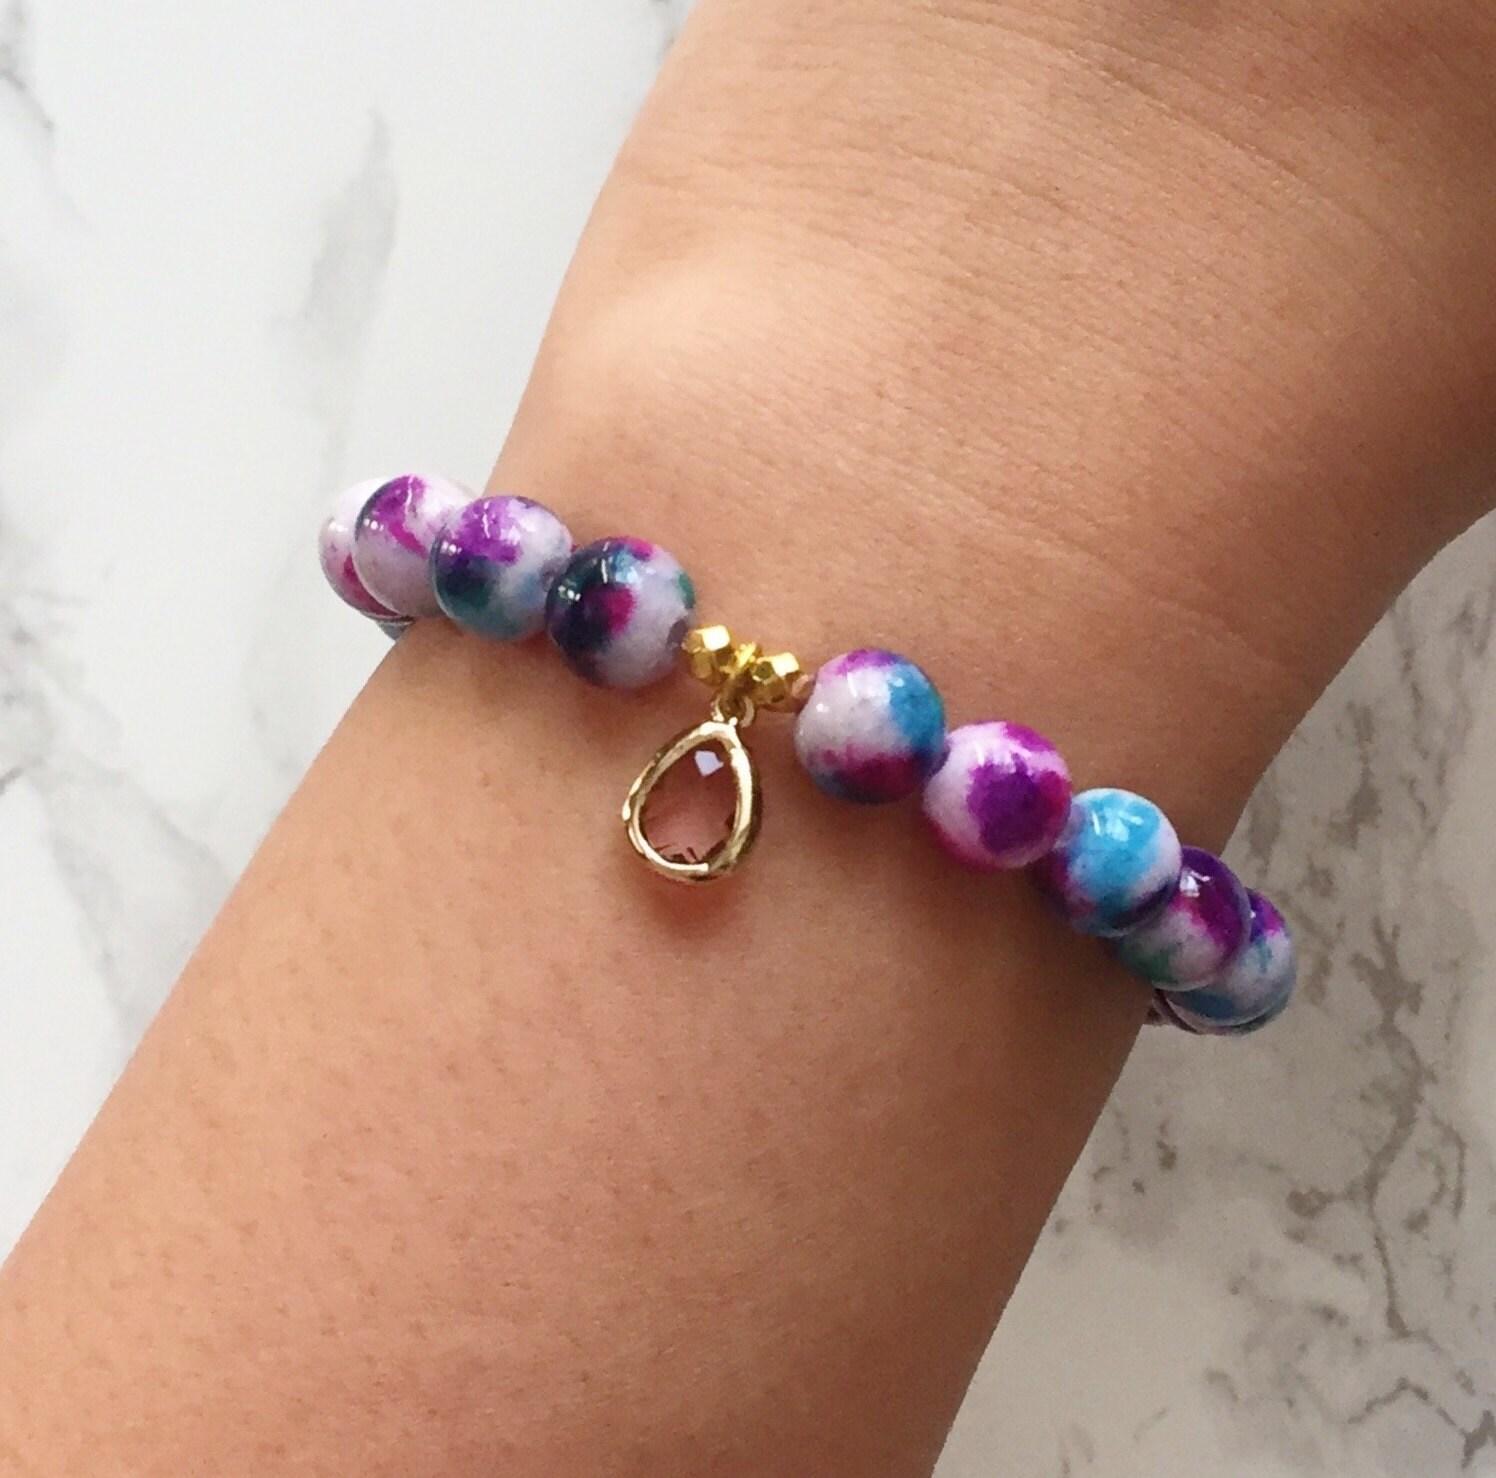 Watercolor Bracelet Charm Bracelet - Purple & Blue